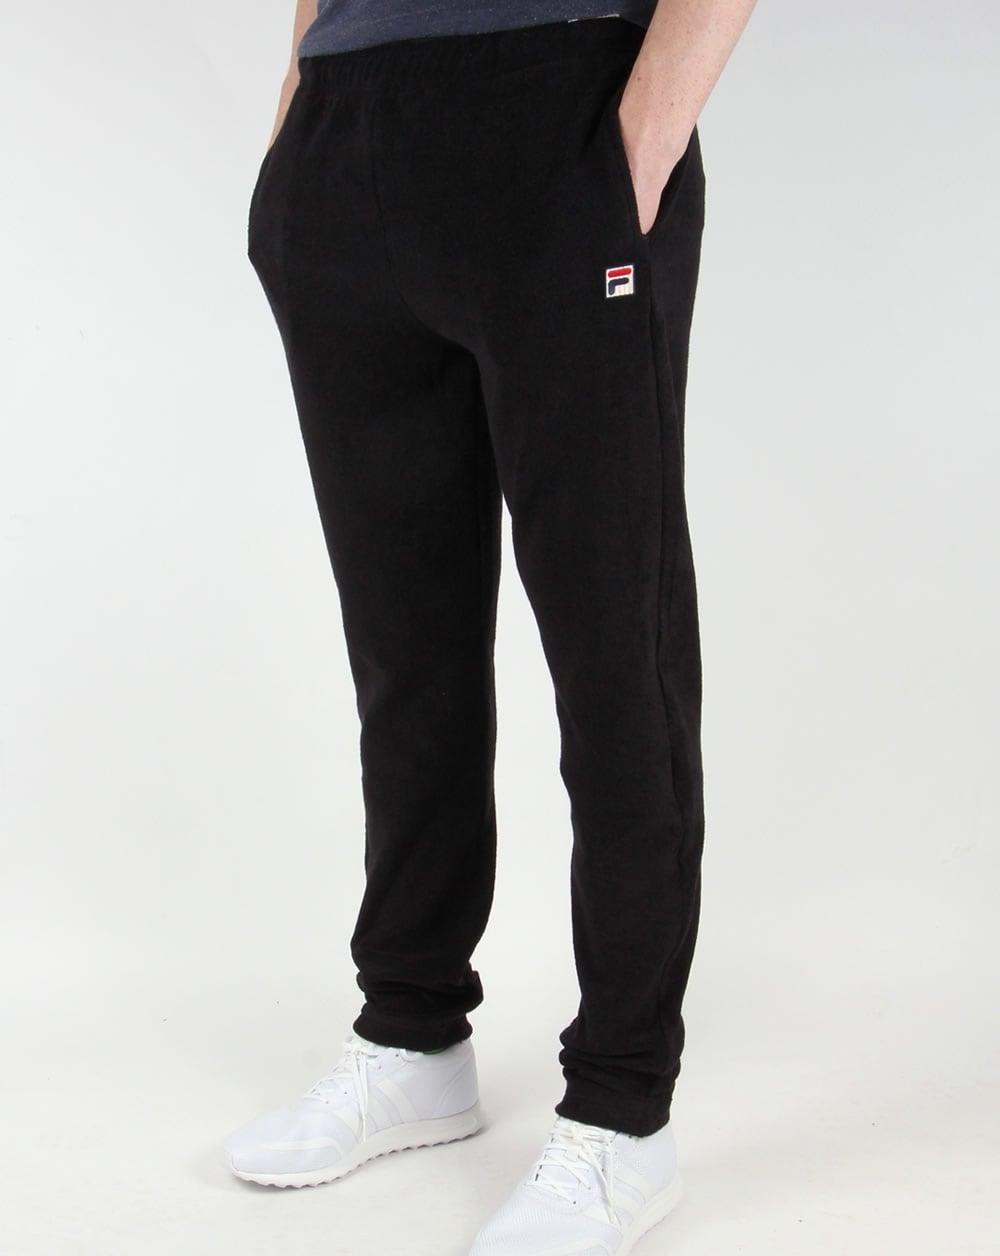 fila-vintage-stoppini-toweling-track-pants-black-p8300-55924_image